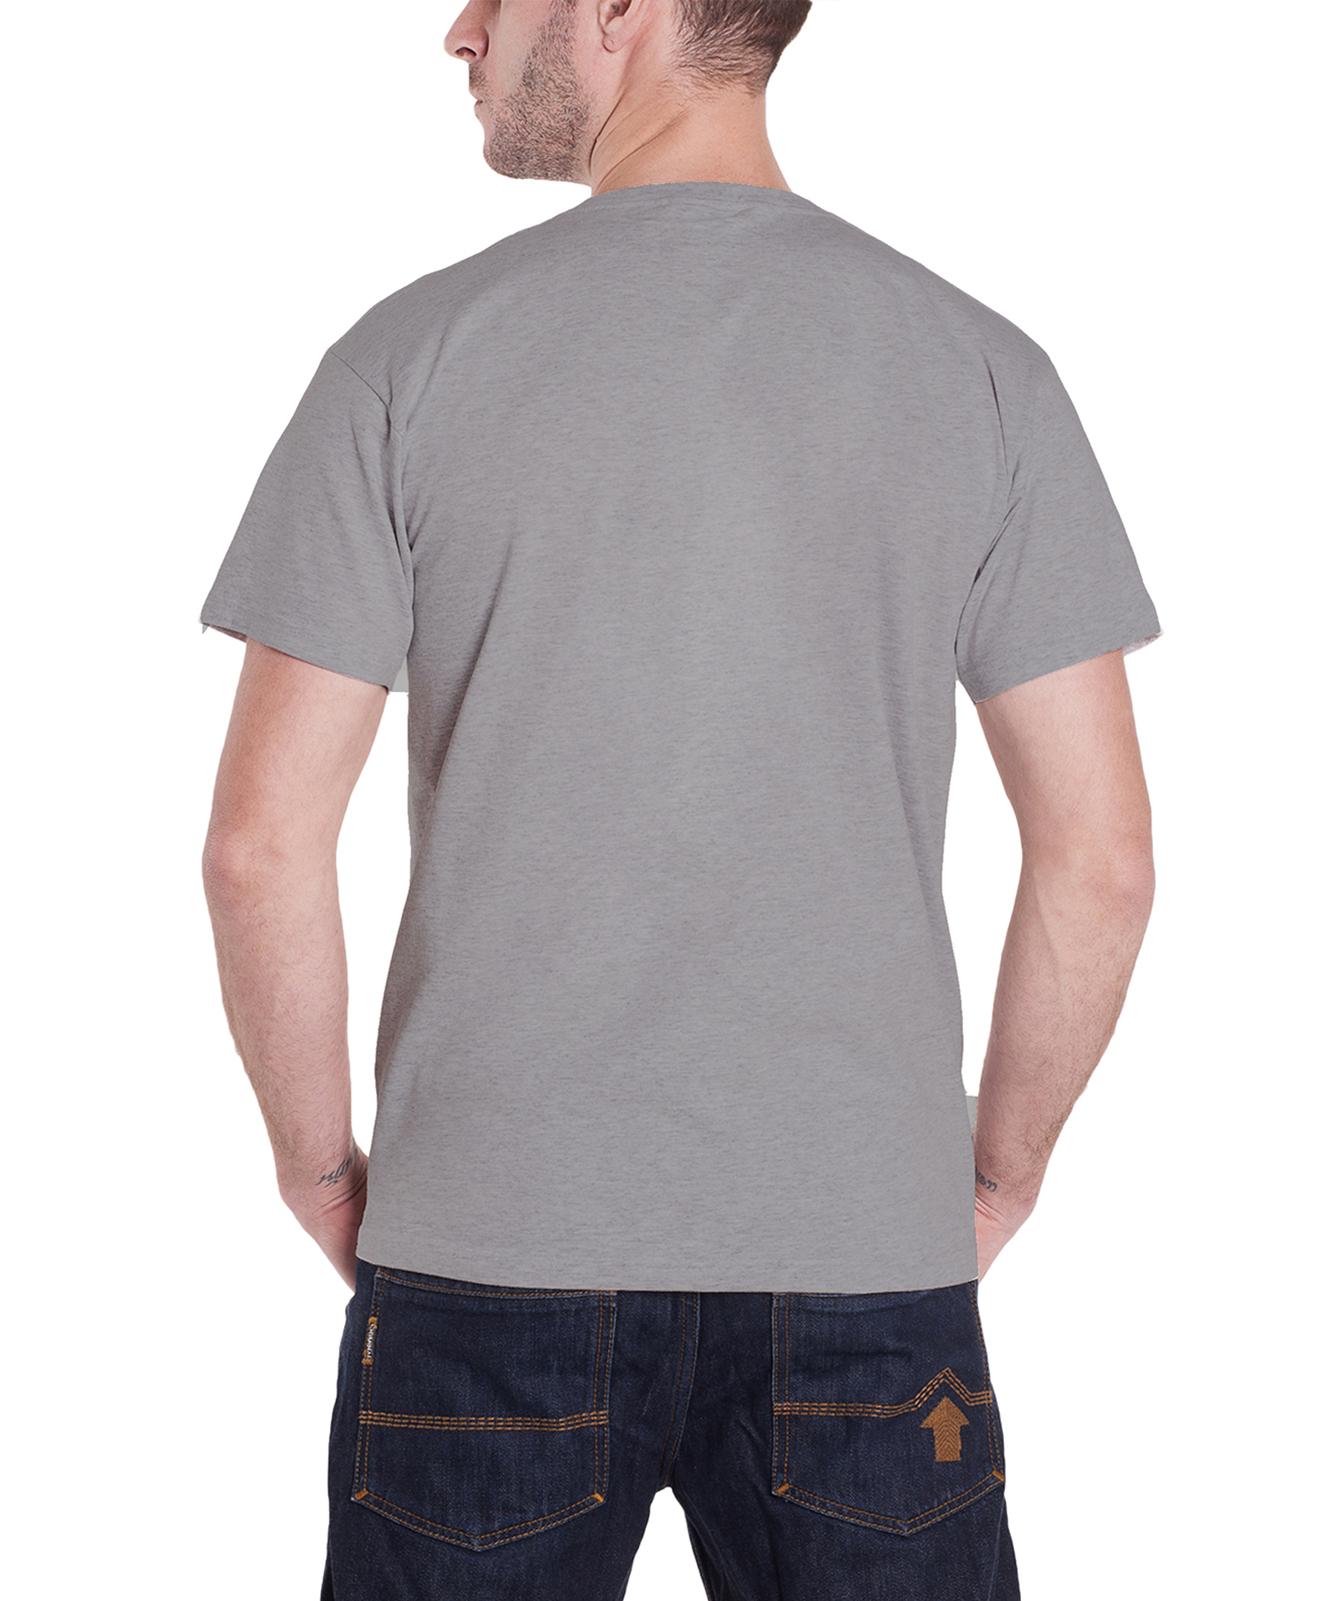 Official-Gas-Monkey-Garage-T-Shirt-Official-GMG-Logo-Kustom-Builds-new-Mens Indexbild 43